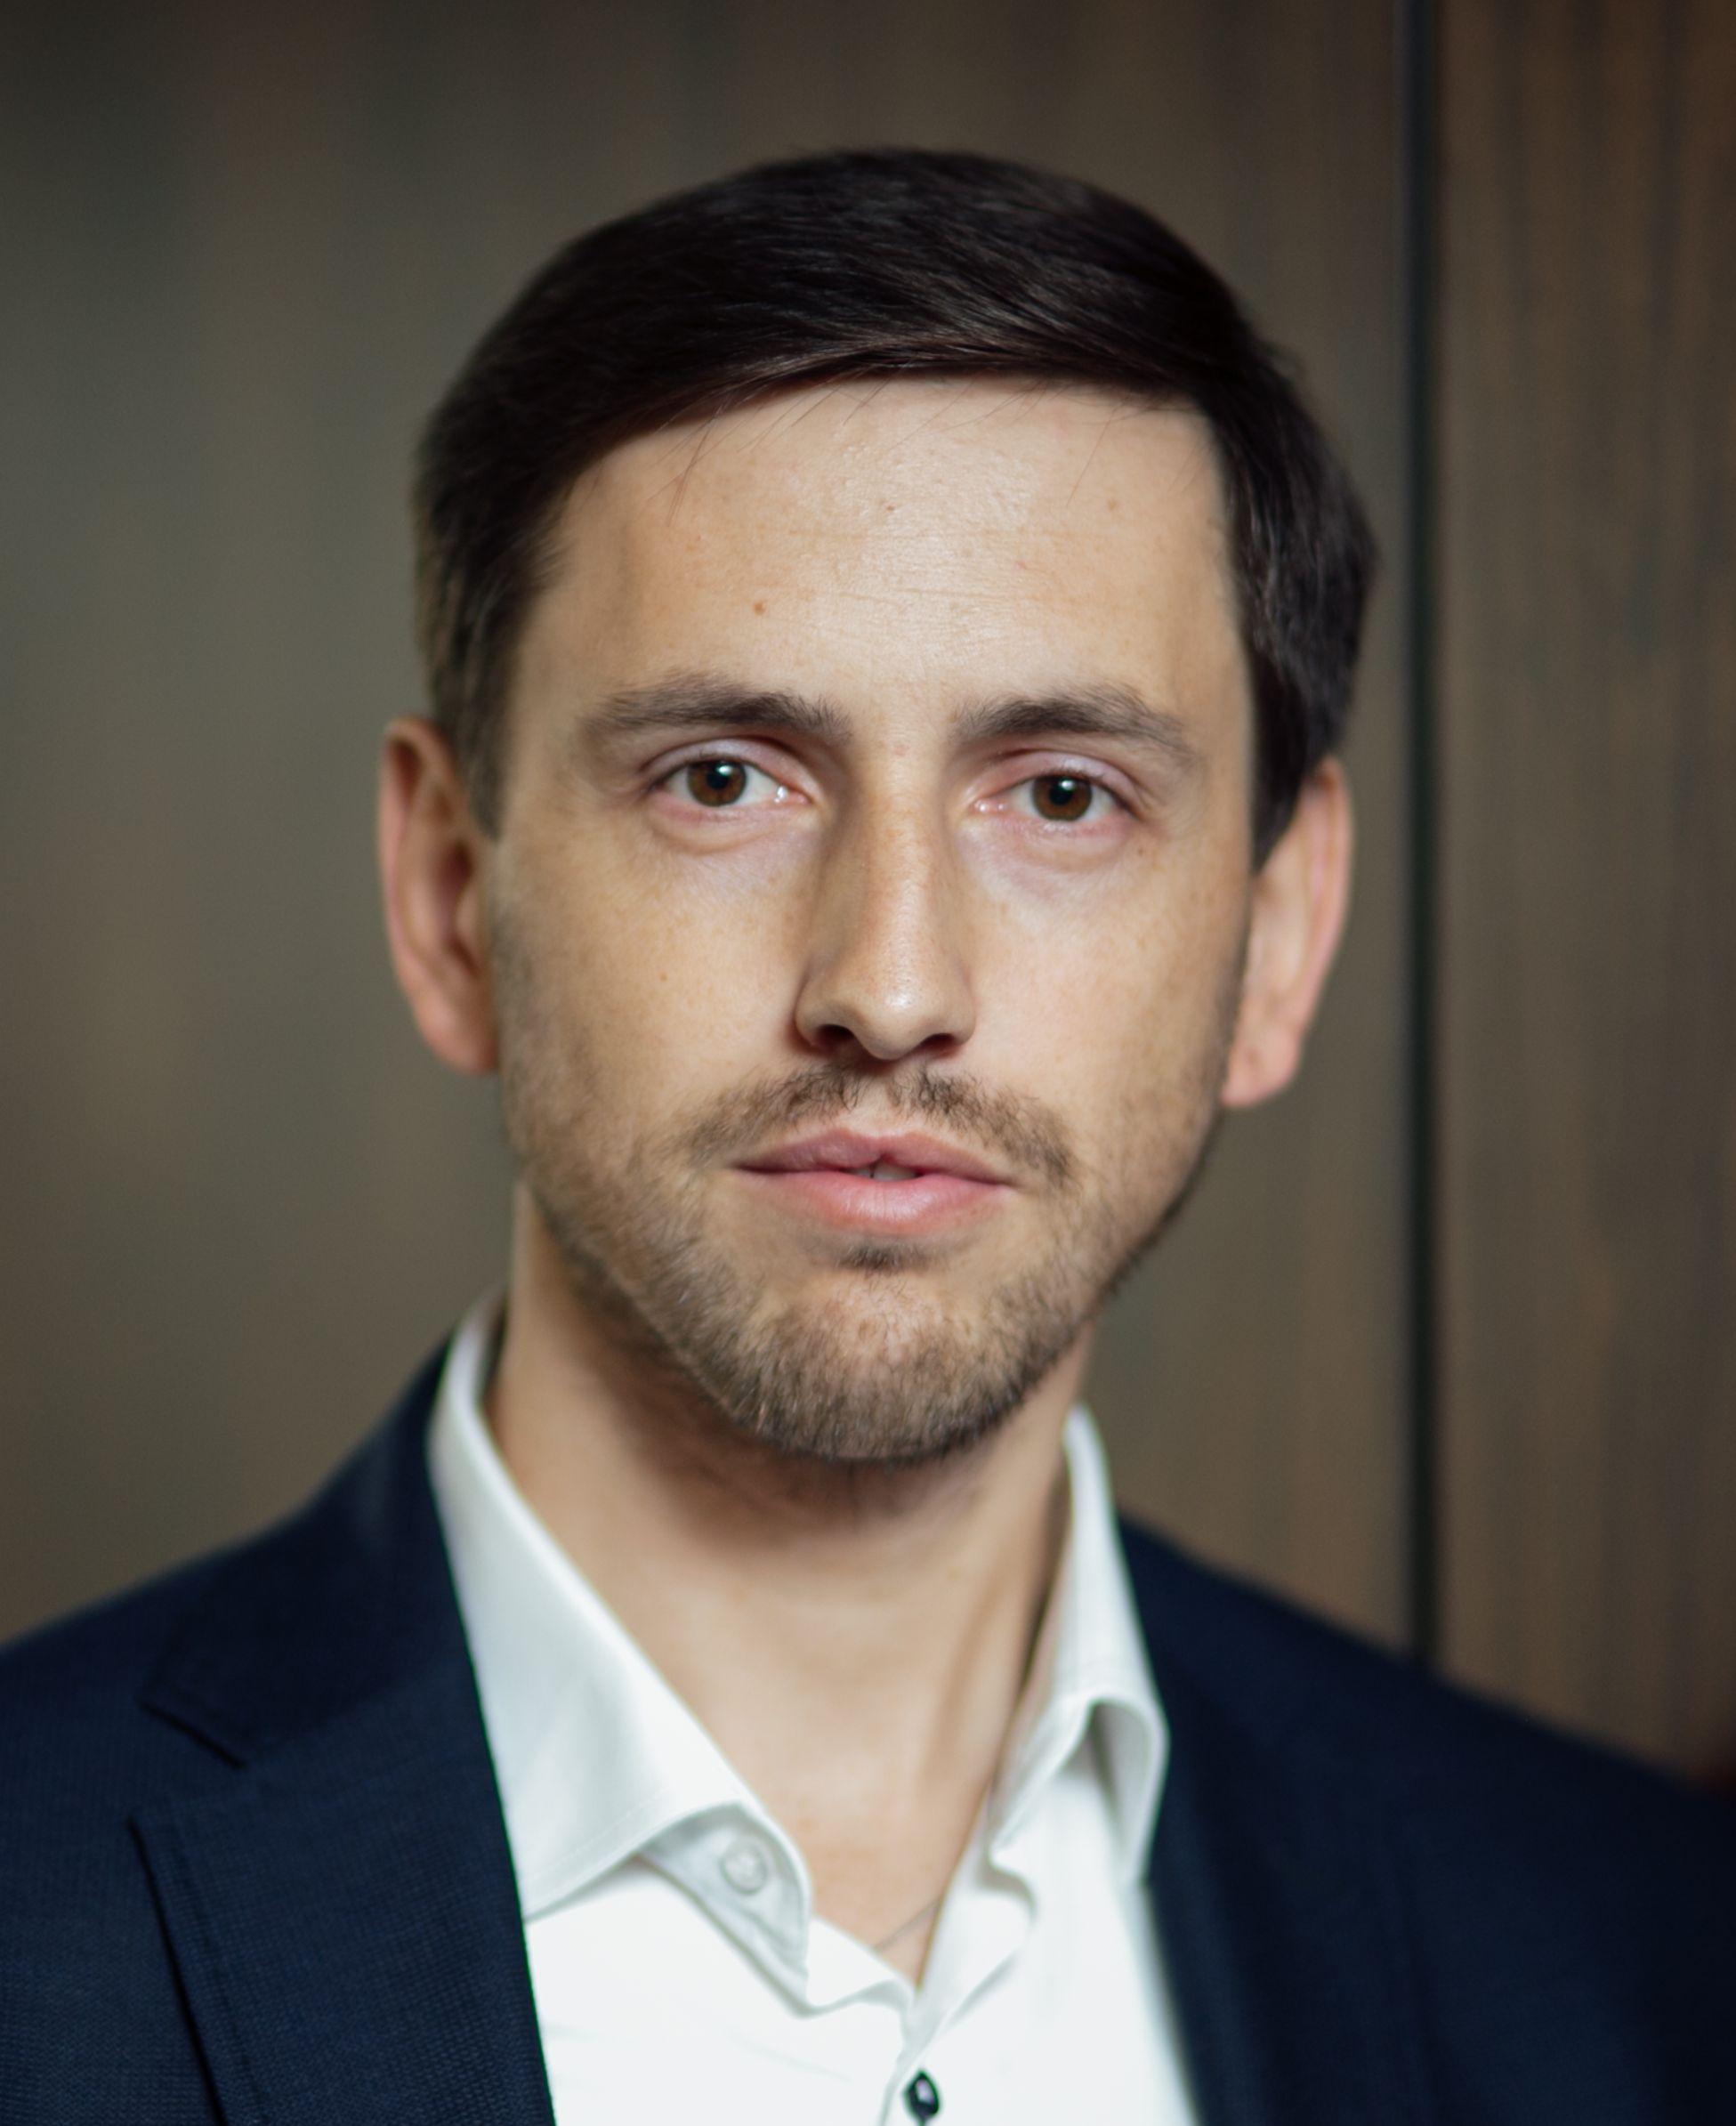 Robert Noworolski